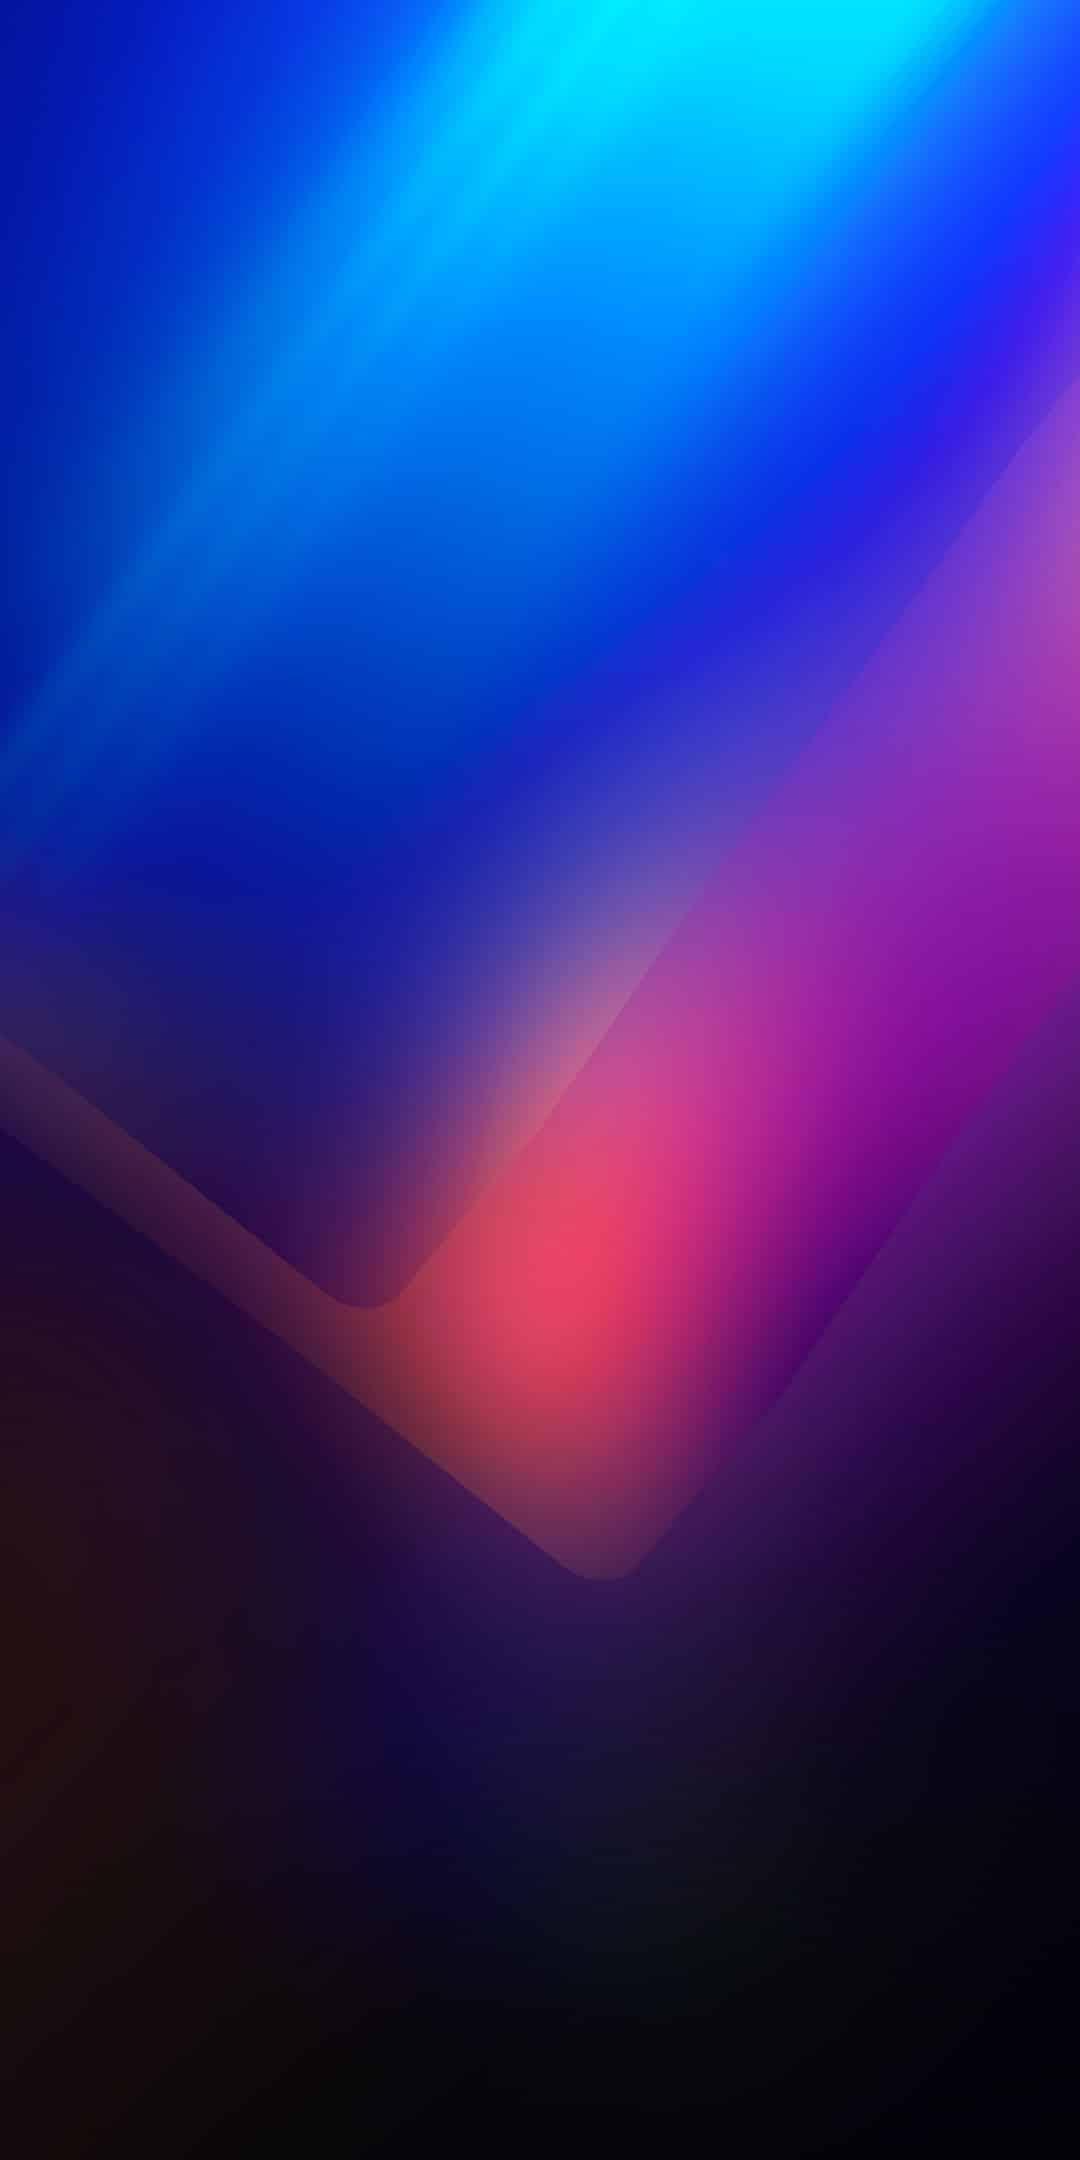 Redmi 6 Pro Wallpaper Hd Download 1080x2160 Download Hd Wallpaper Wallpapertip